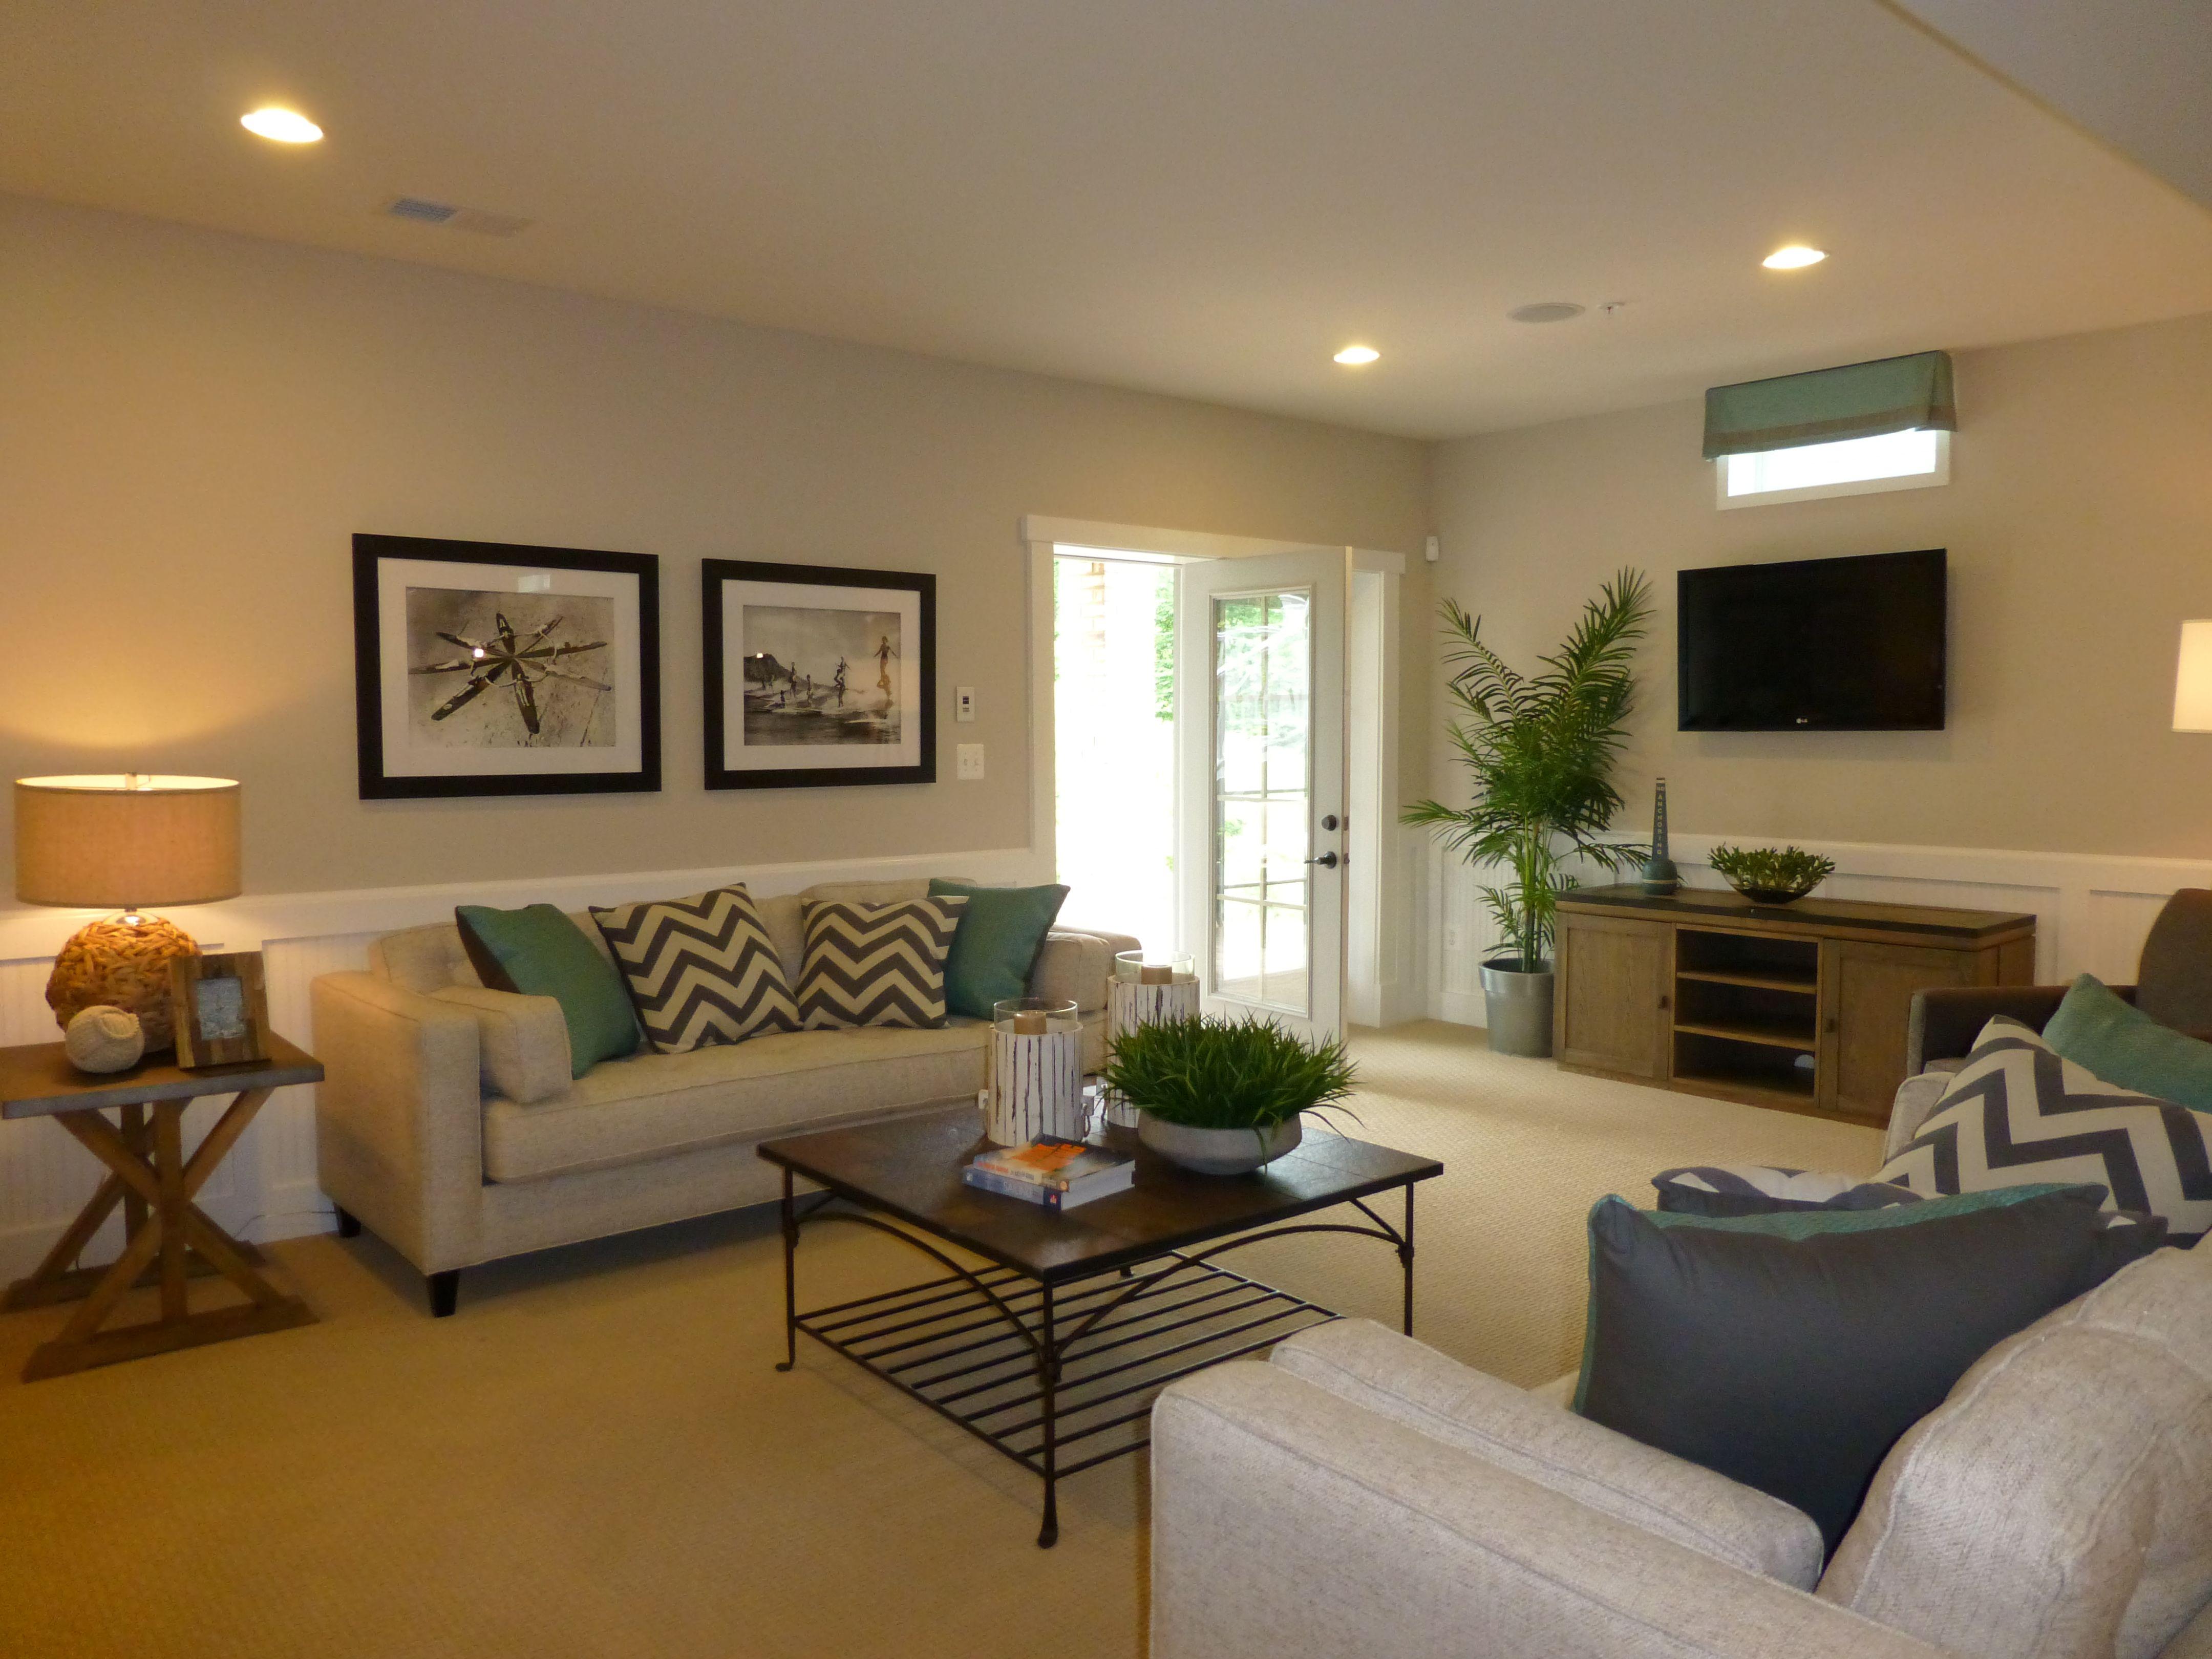 Model home basements